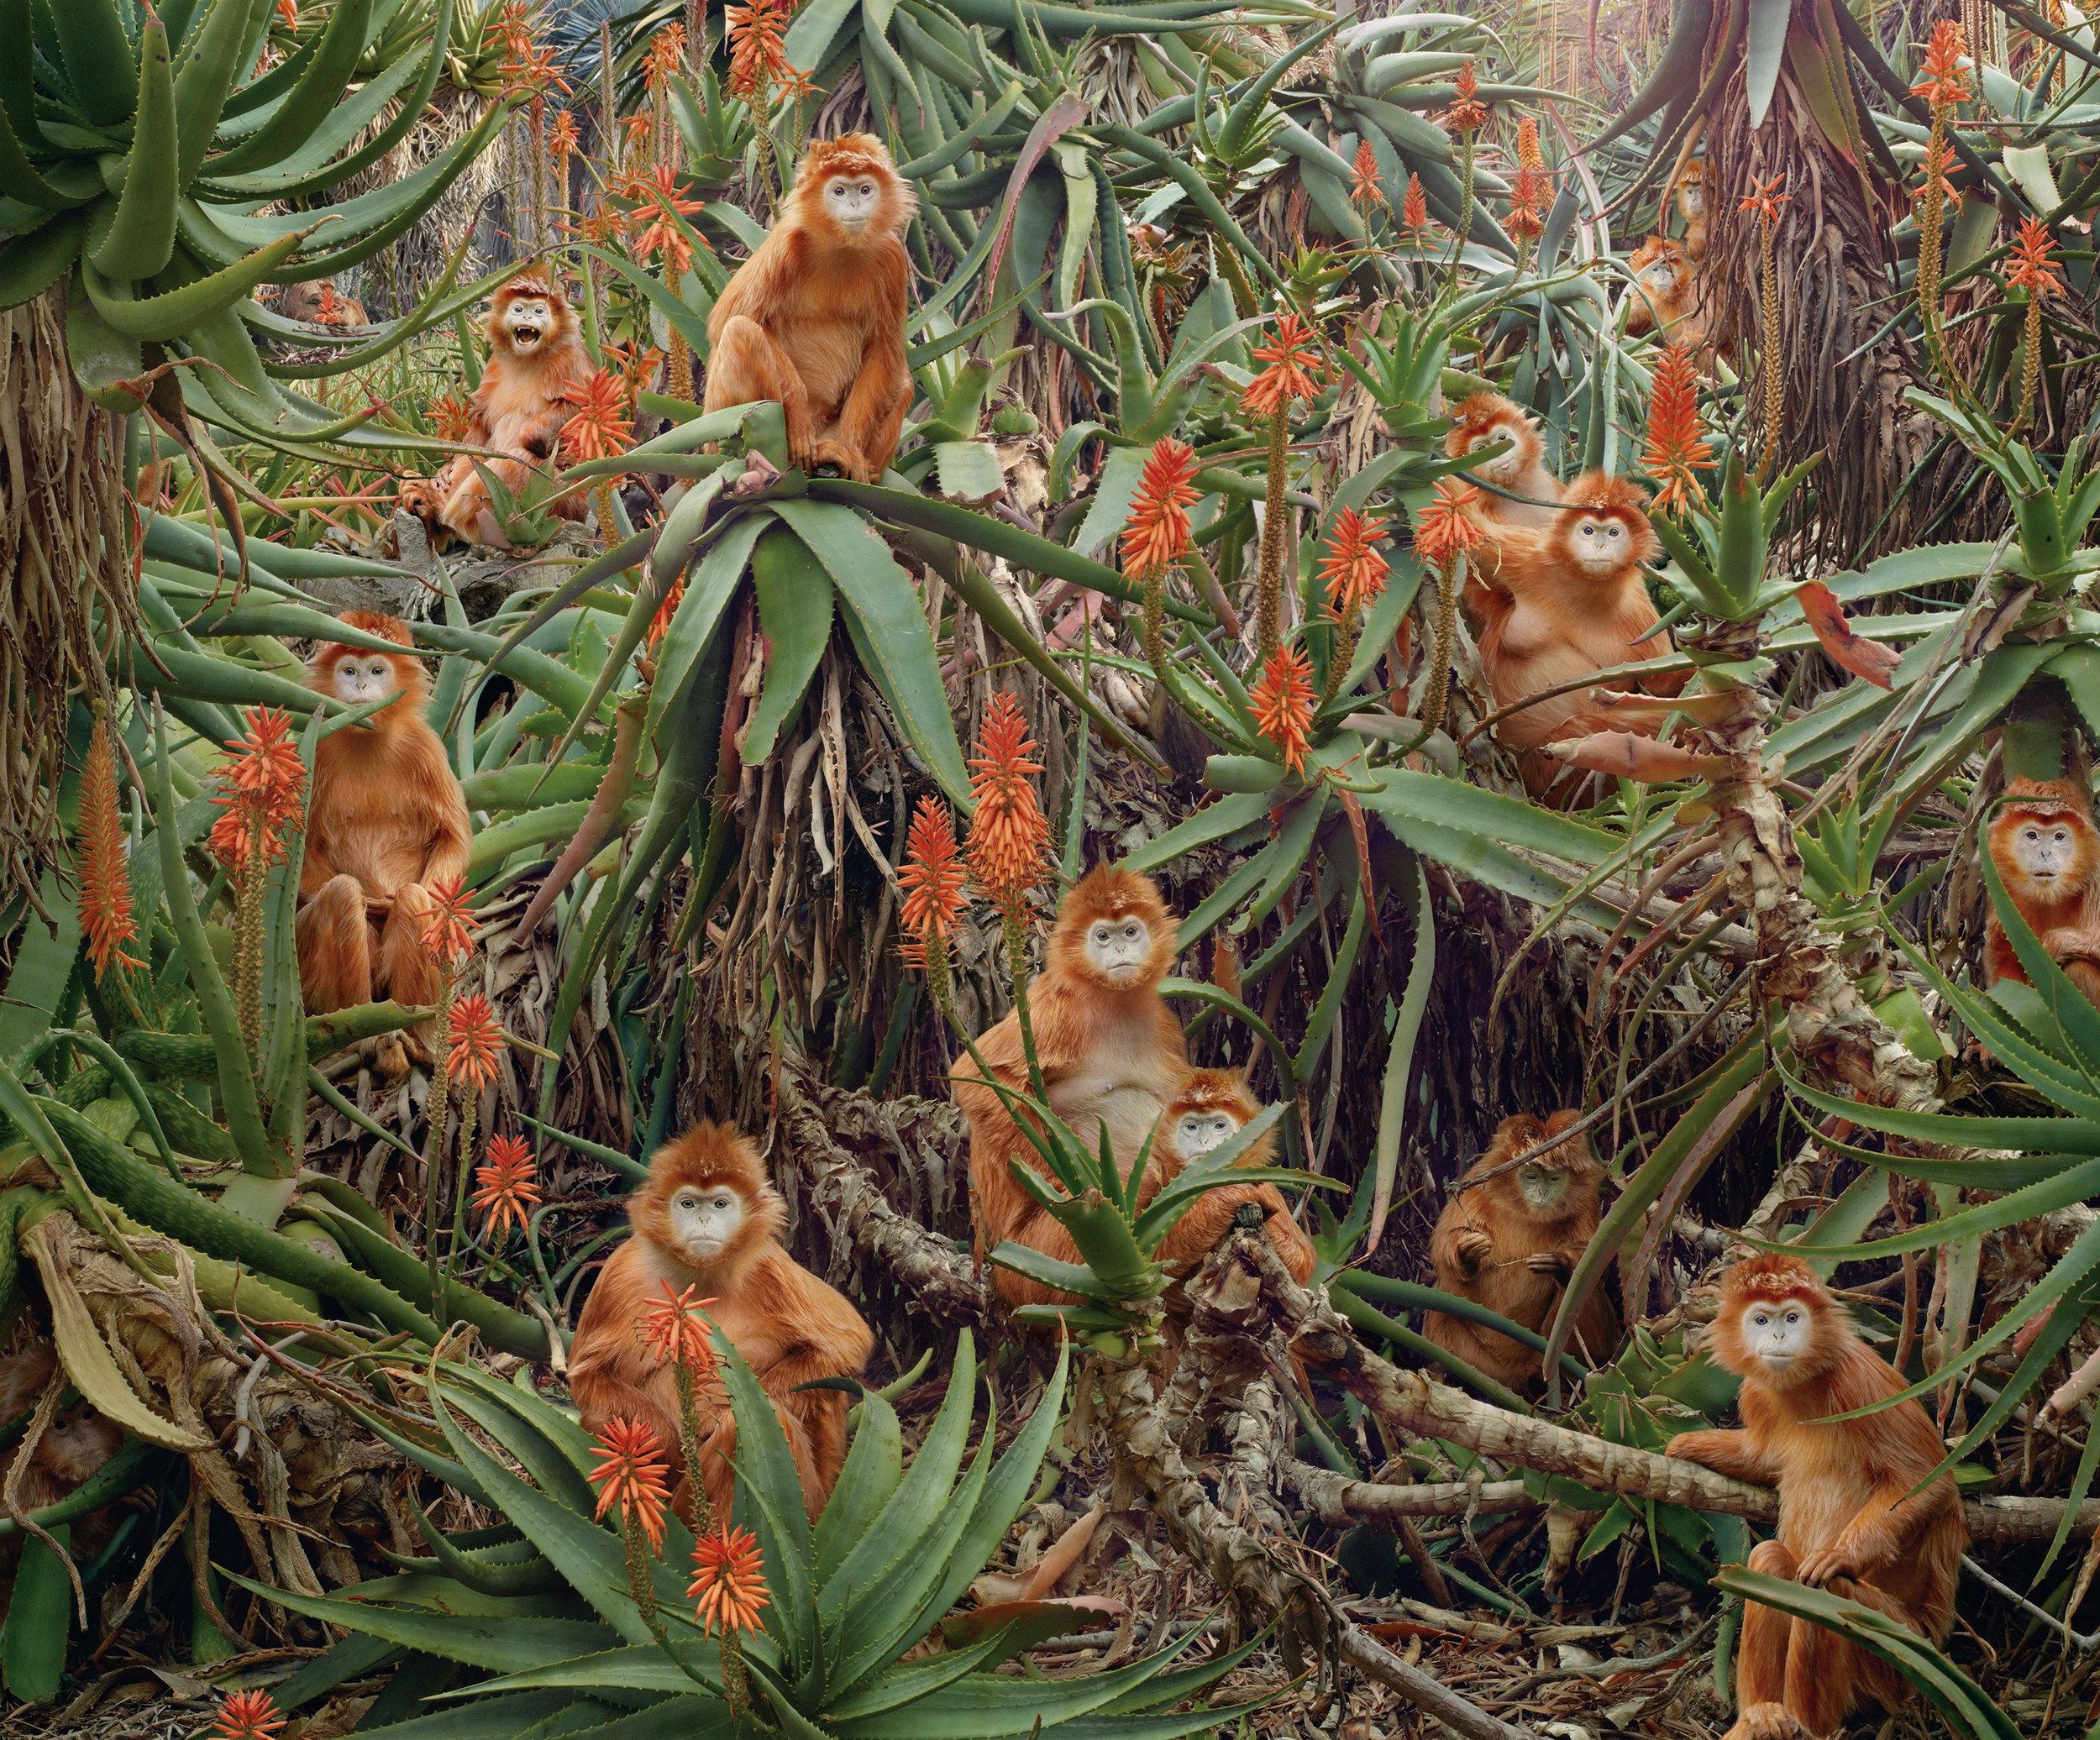 24_SJohan_#174 (Red Monkeys).jpg